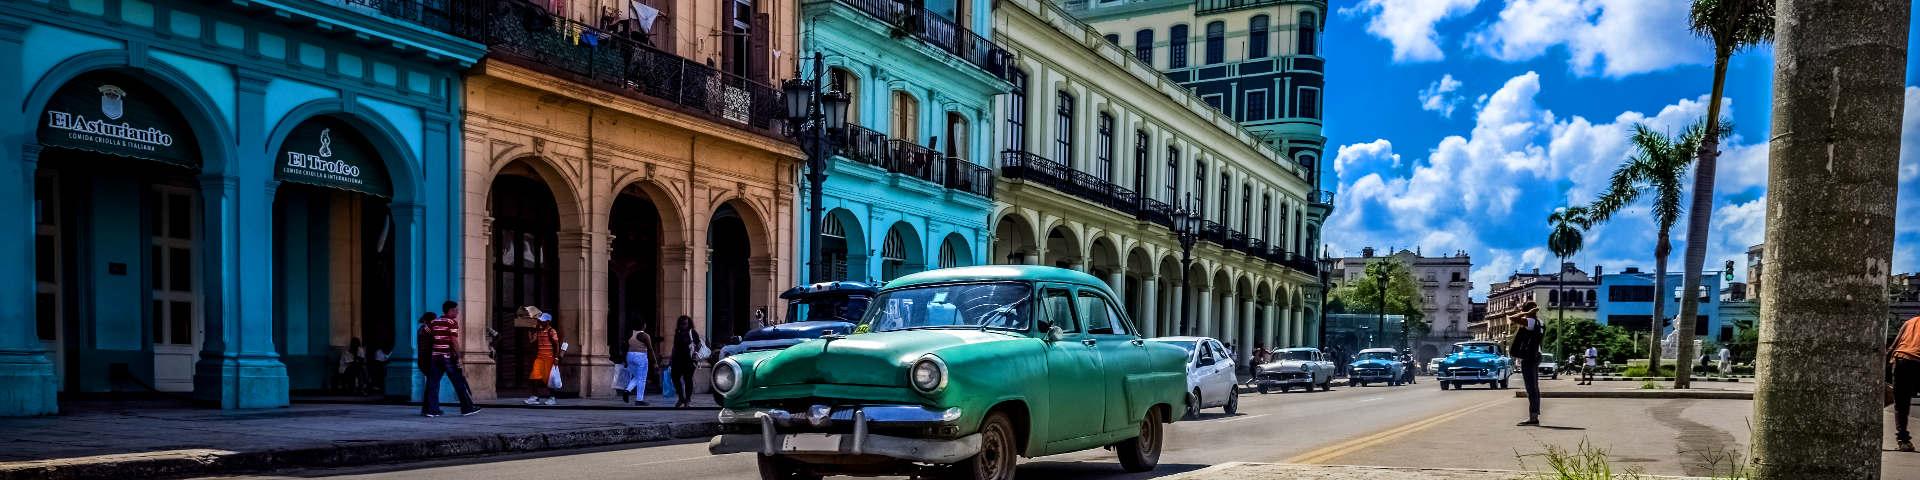 Cuba havana hero